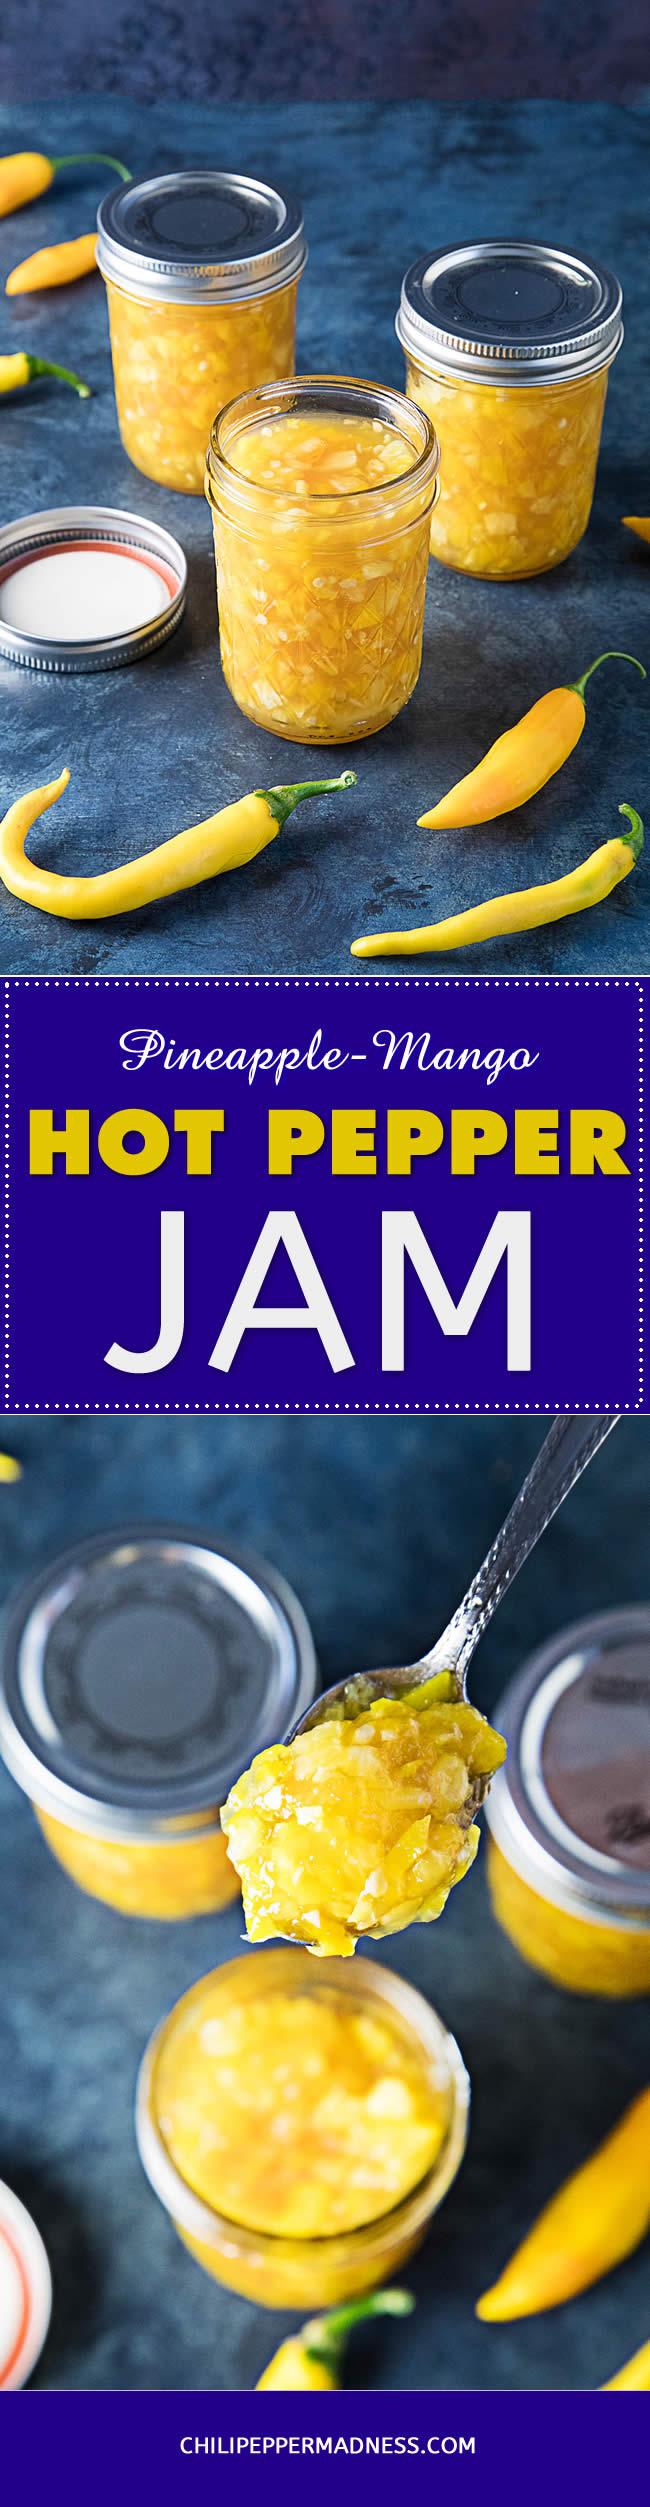 Pineapple-Mango-Hot Pepper Jam - Recipe